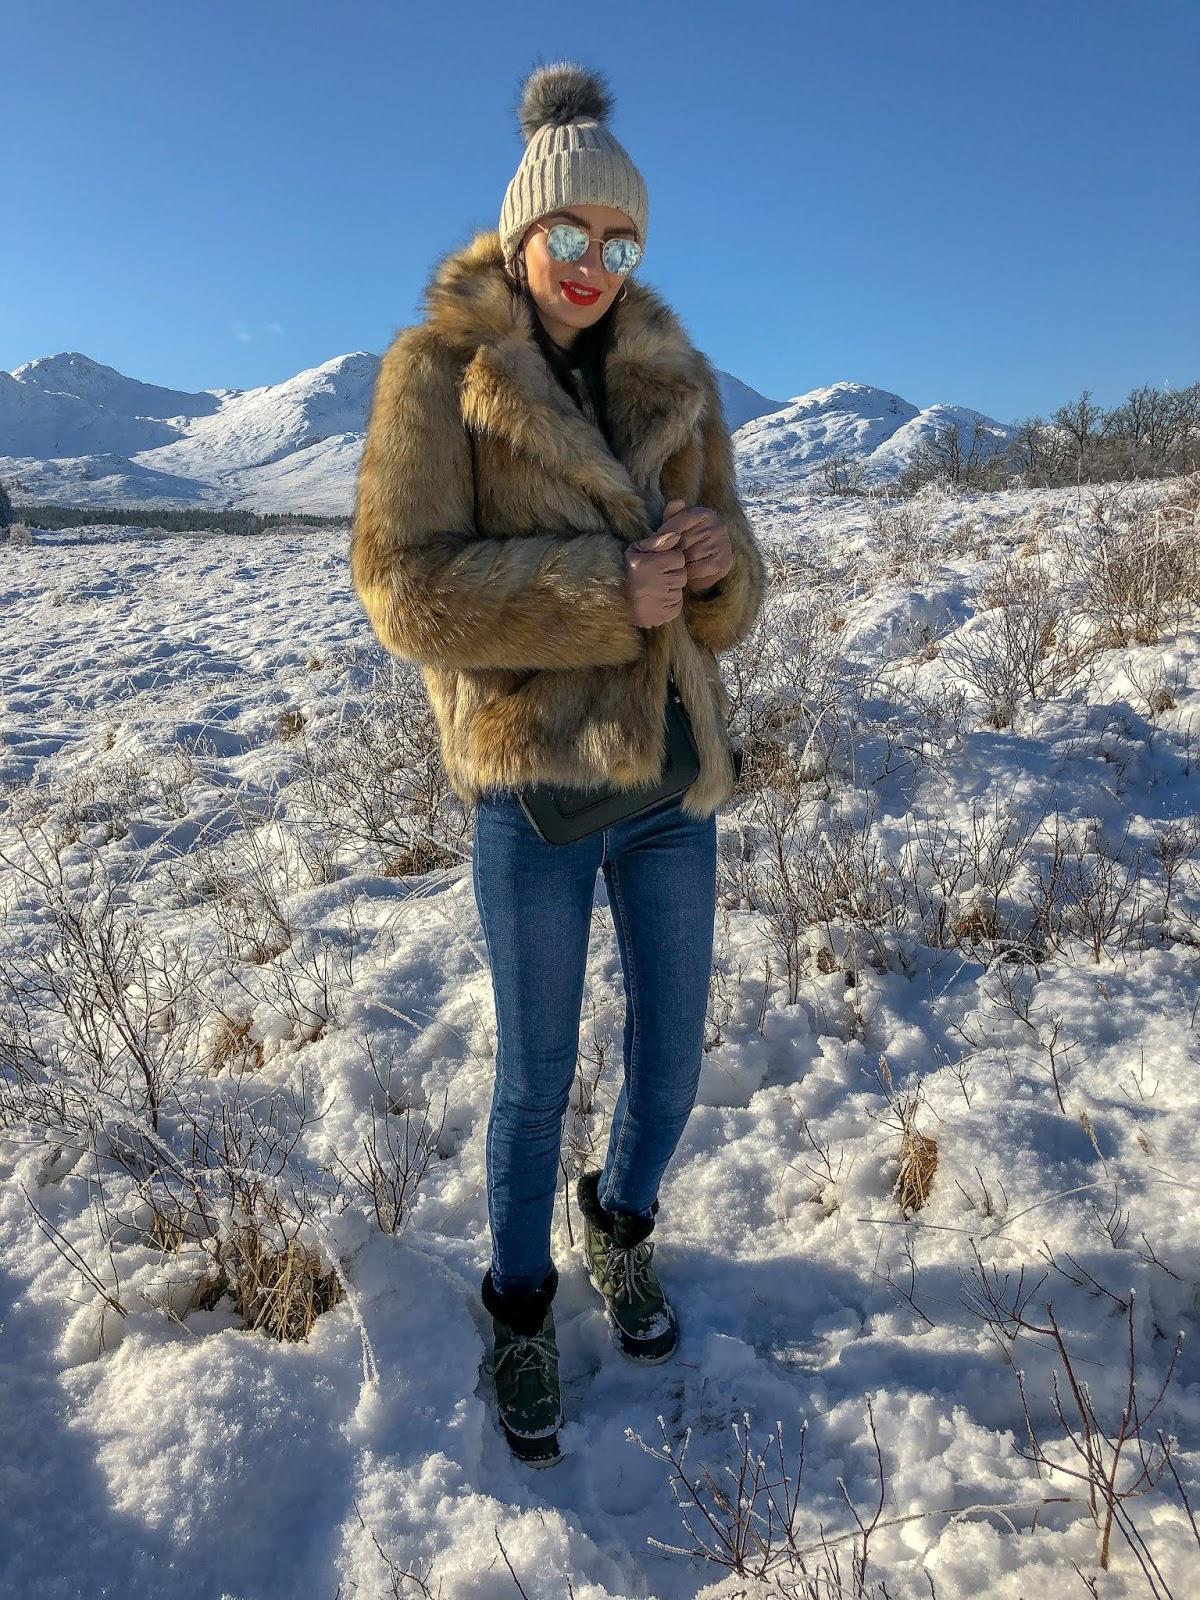 winter snow style